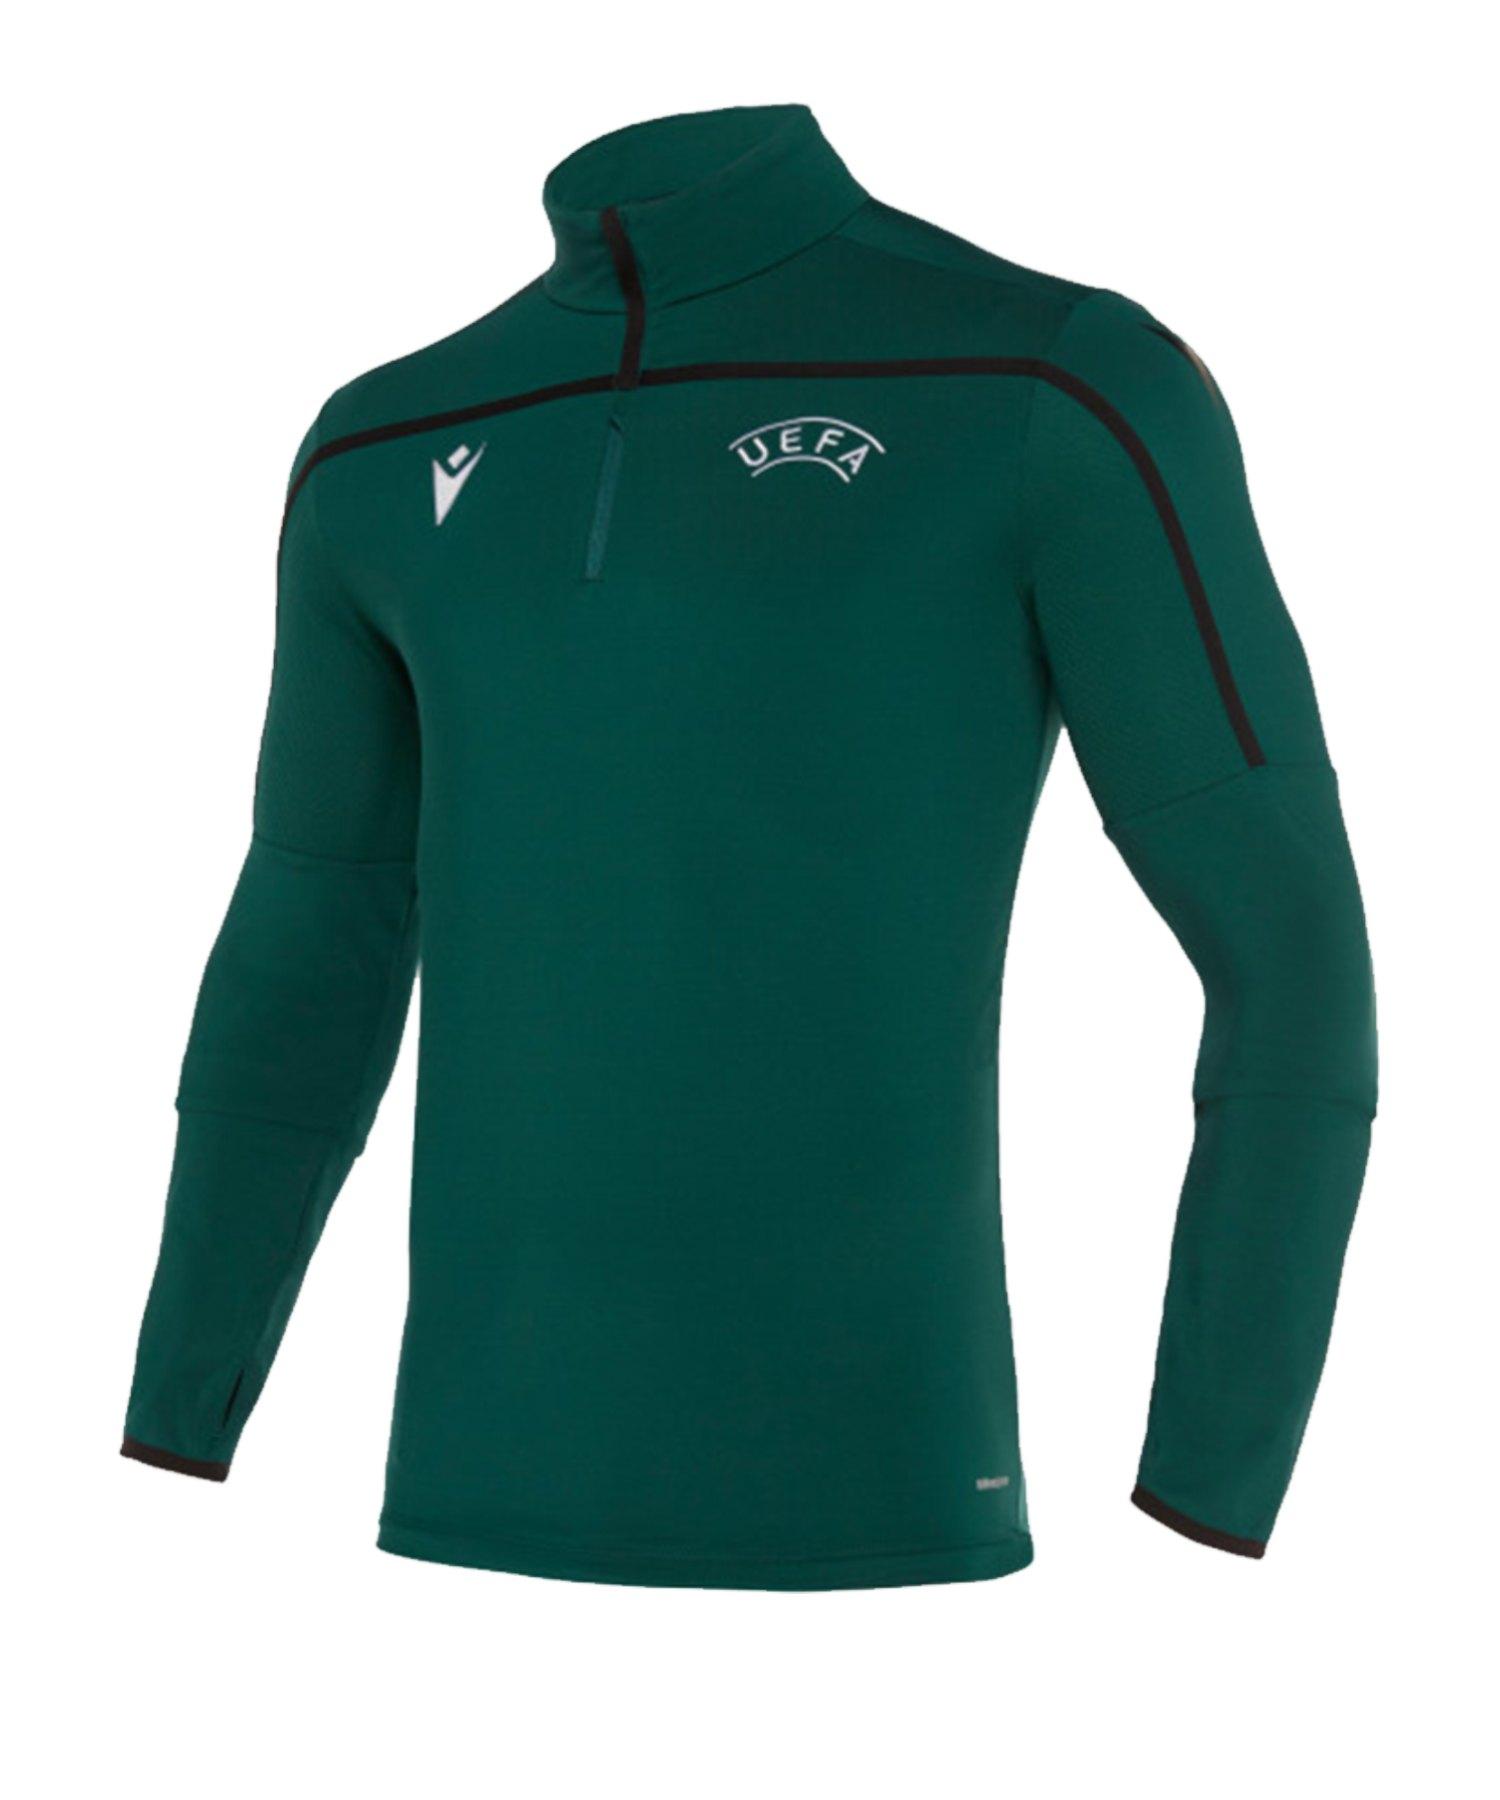 Macron UEFA Offizielles Training Sweatshirt Grün - gruen